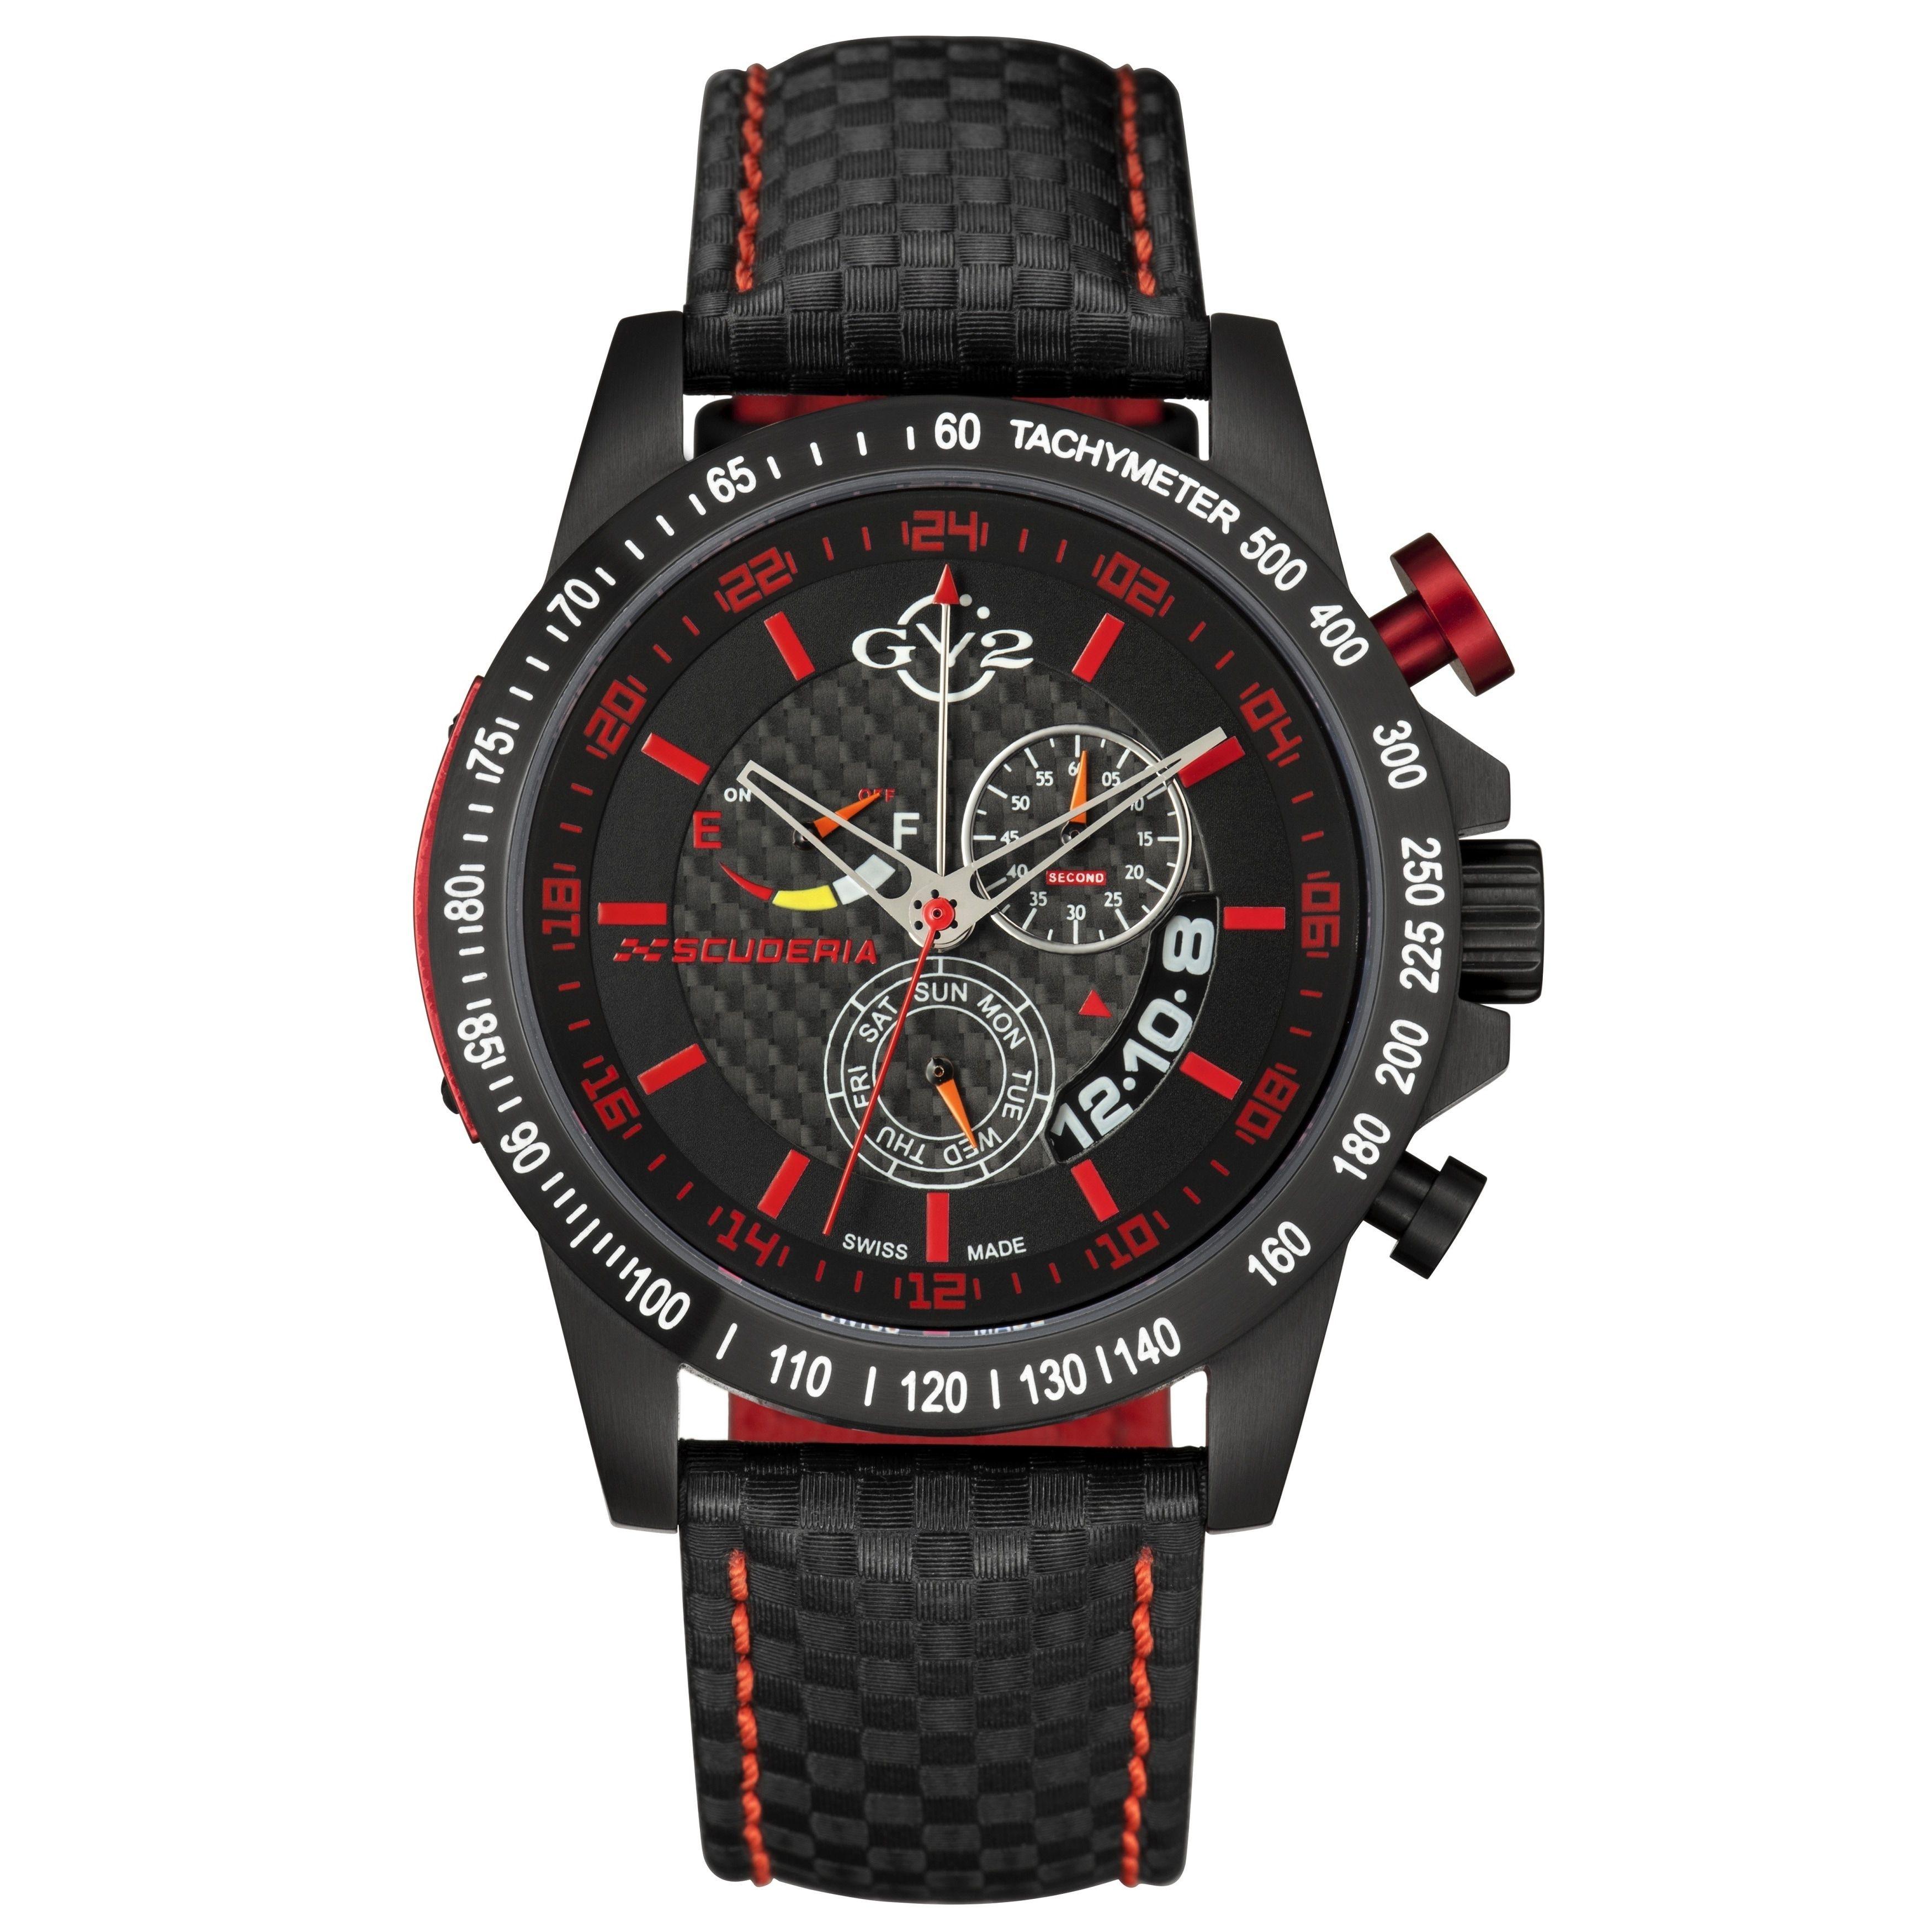 Gevril GV2 Swiss Quartz Chronograph Leather Strap Watch